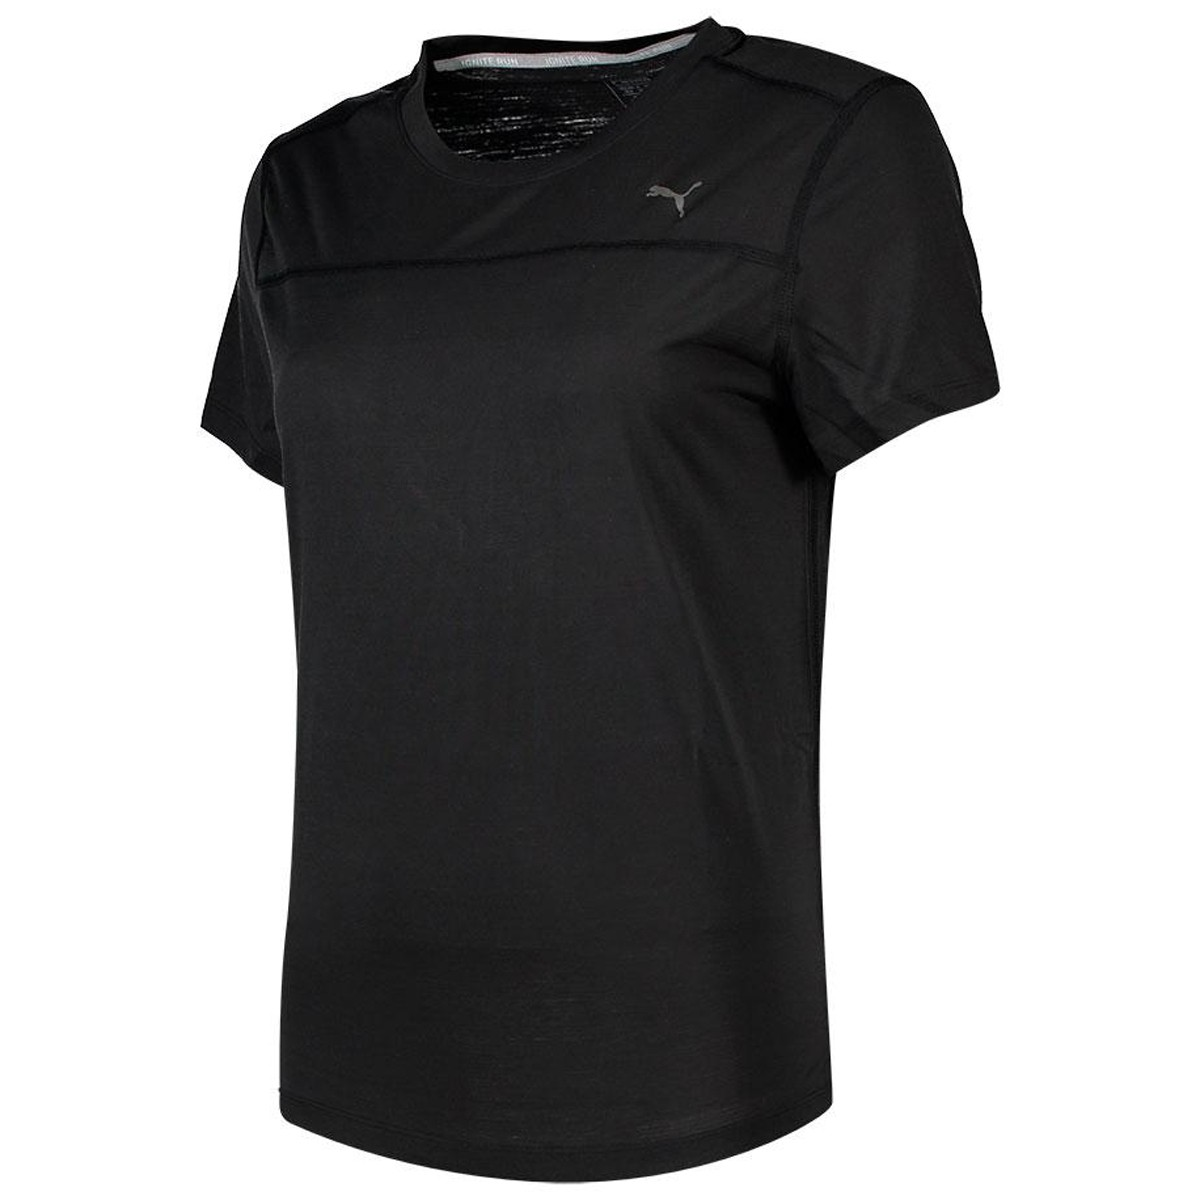 Camiseta Puma Preta Tee Ignite Run - Feminina